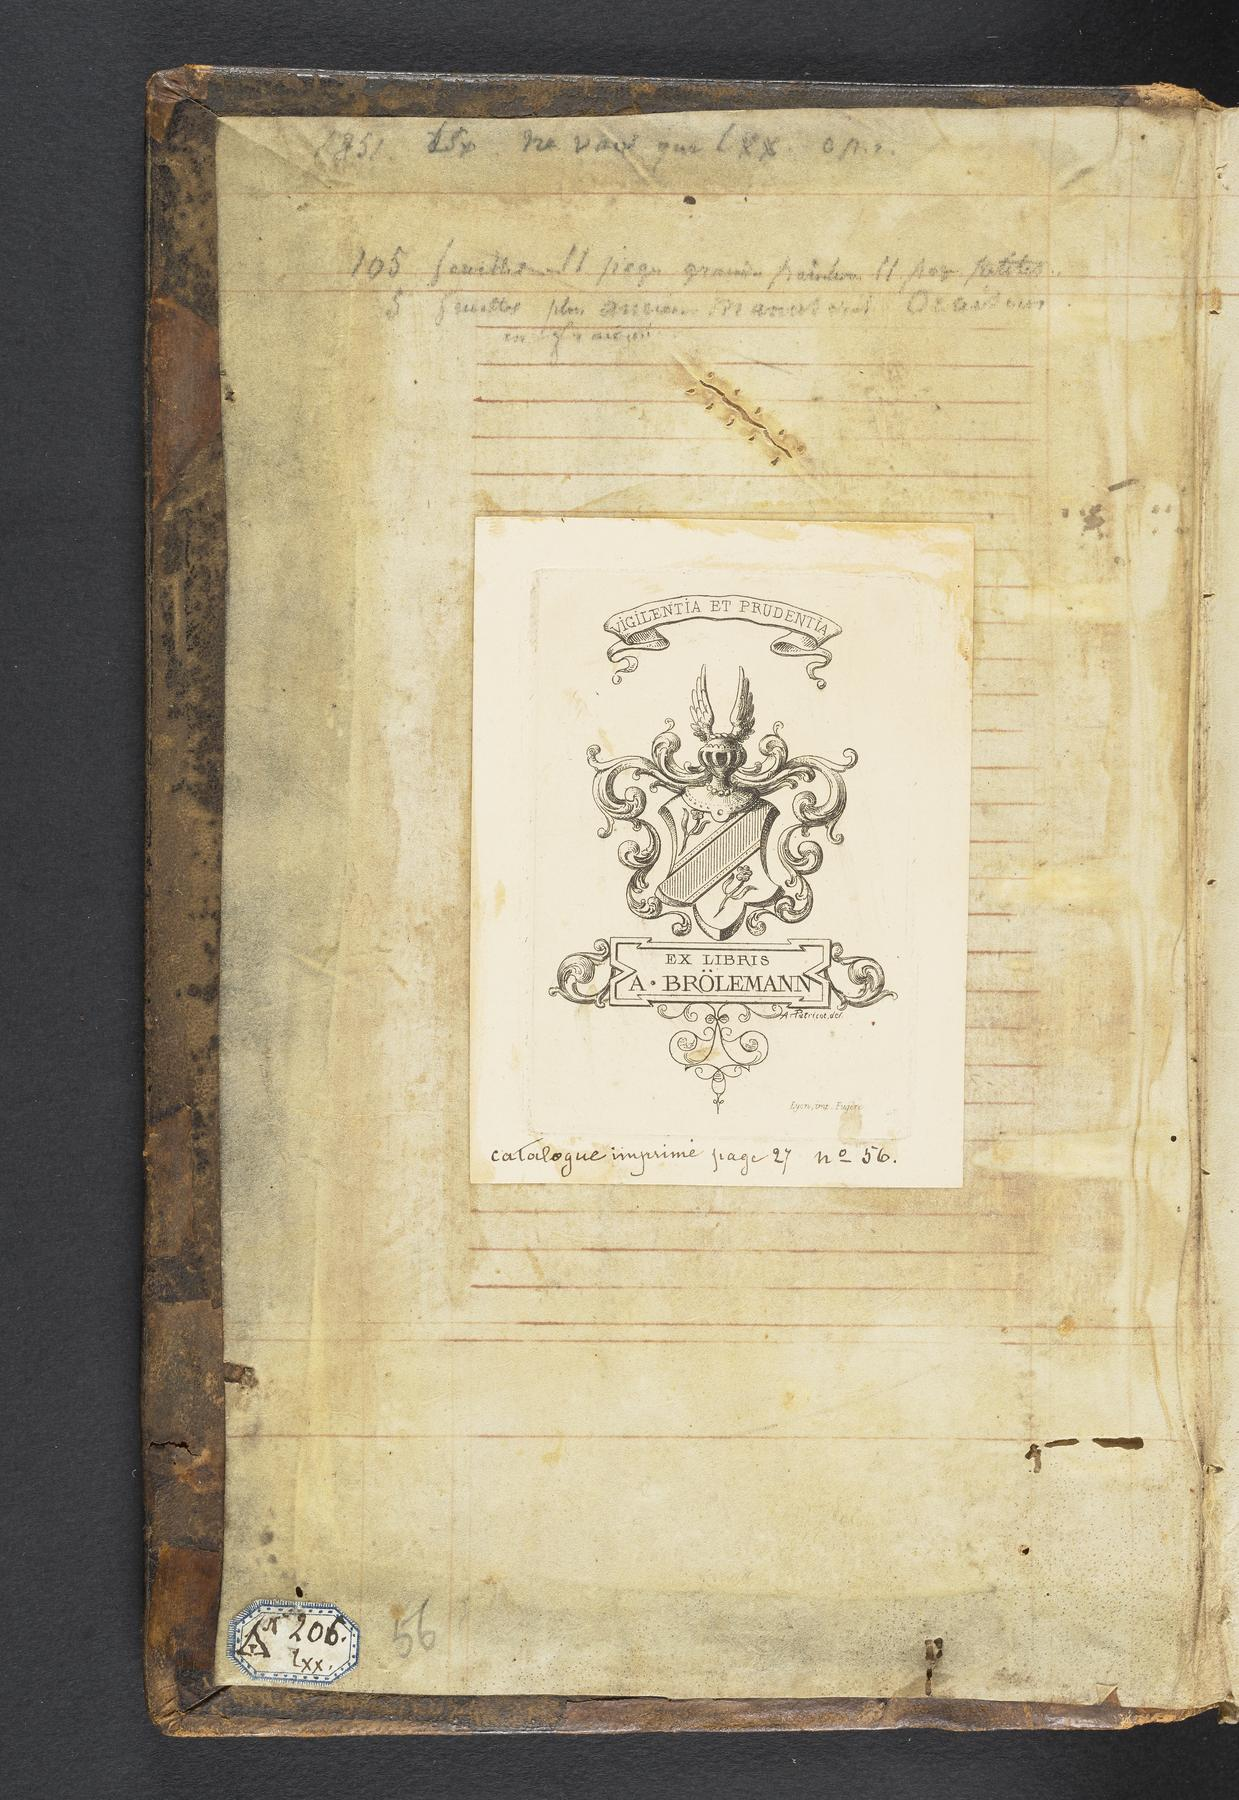 The Philadelphia Museum of Art – Bibliotheca Philadelphiensis